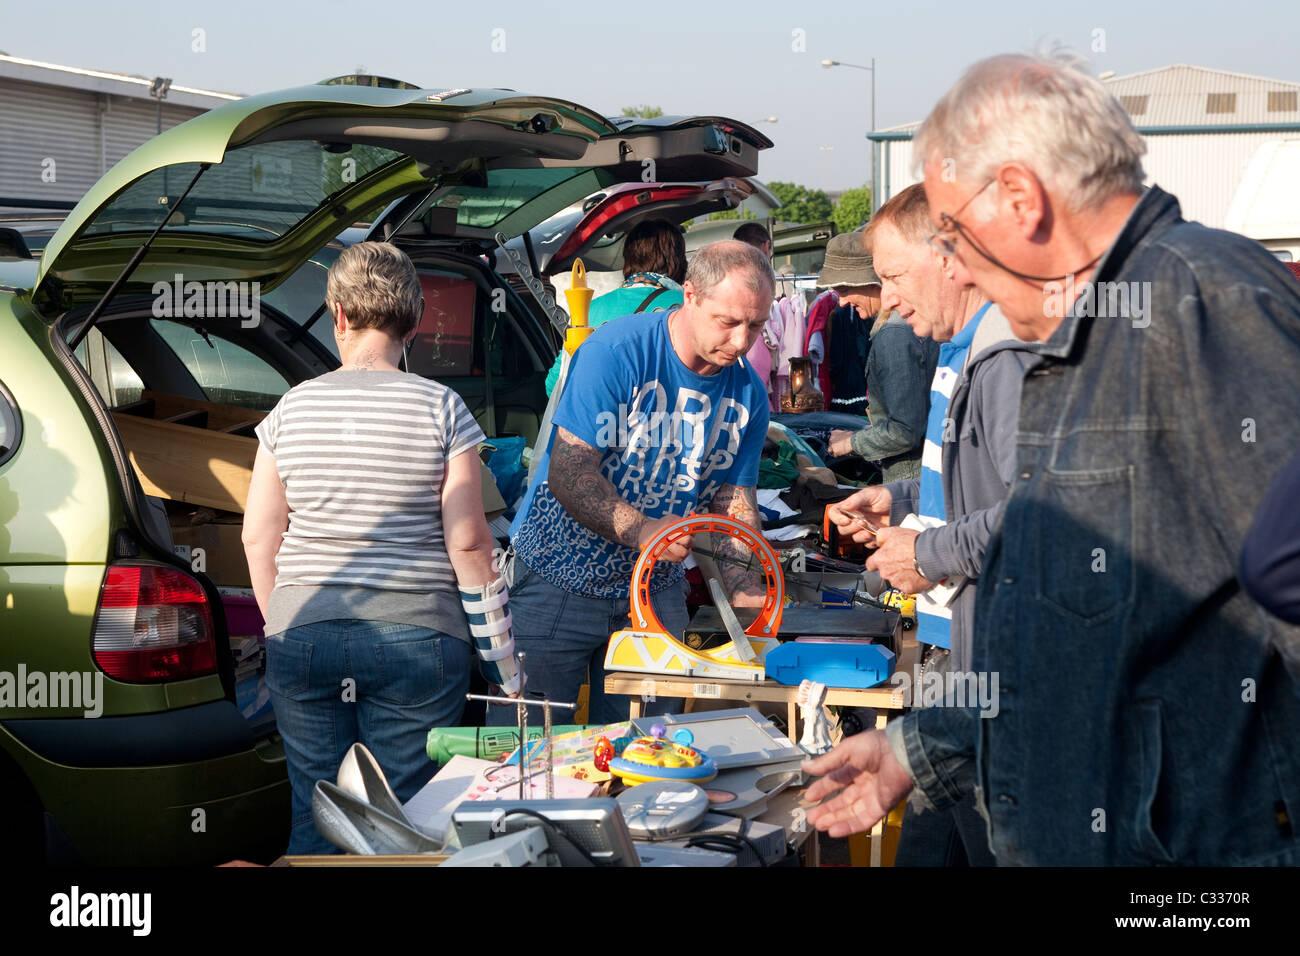 Car boot sale Cardiff, Wales. Photo:Jeff Gilbert - Stock Image